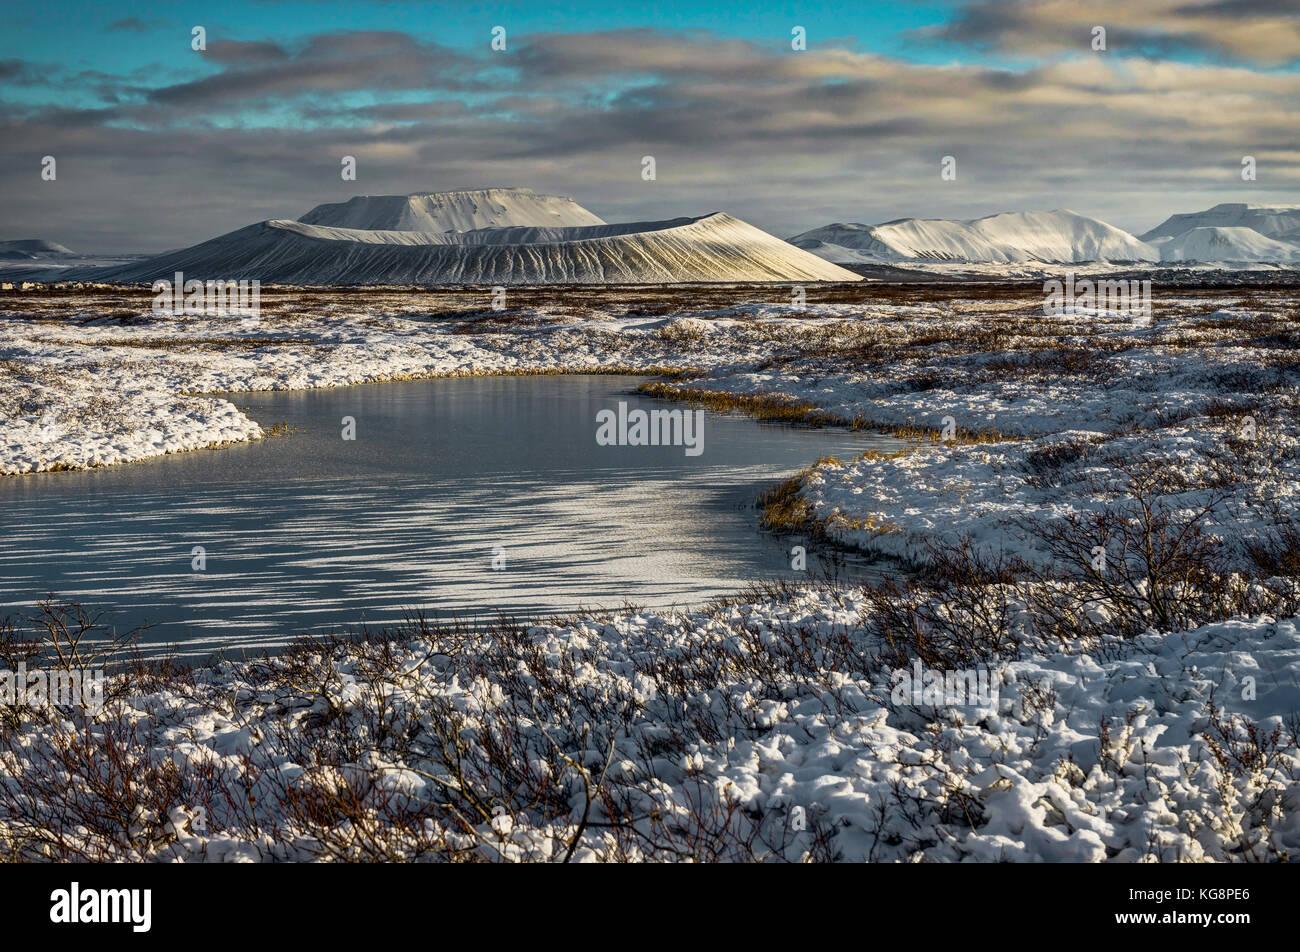 Navidad Paisaje con lago congelado con nevadas Hverfjall Imagen De Stock